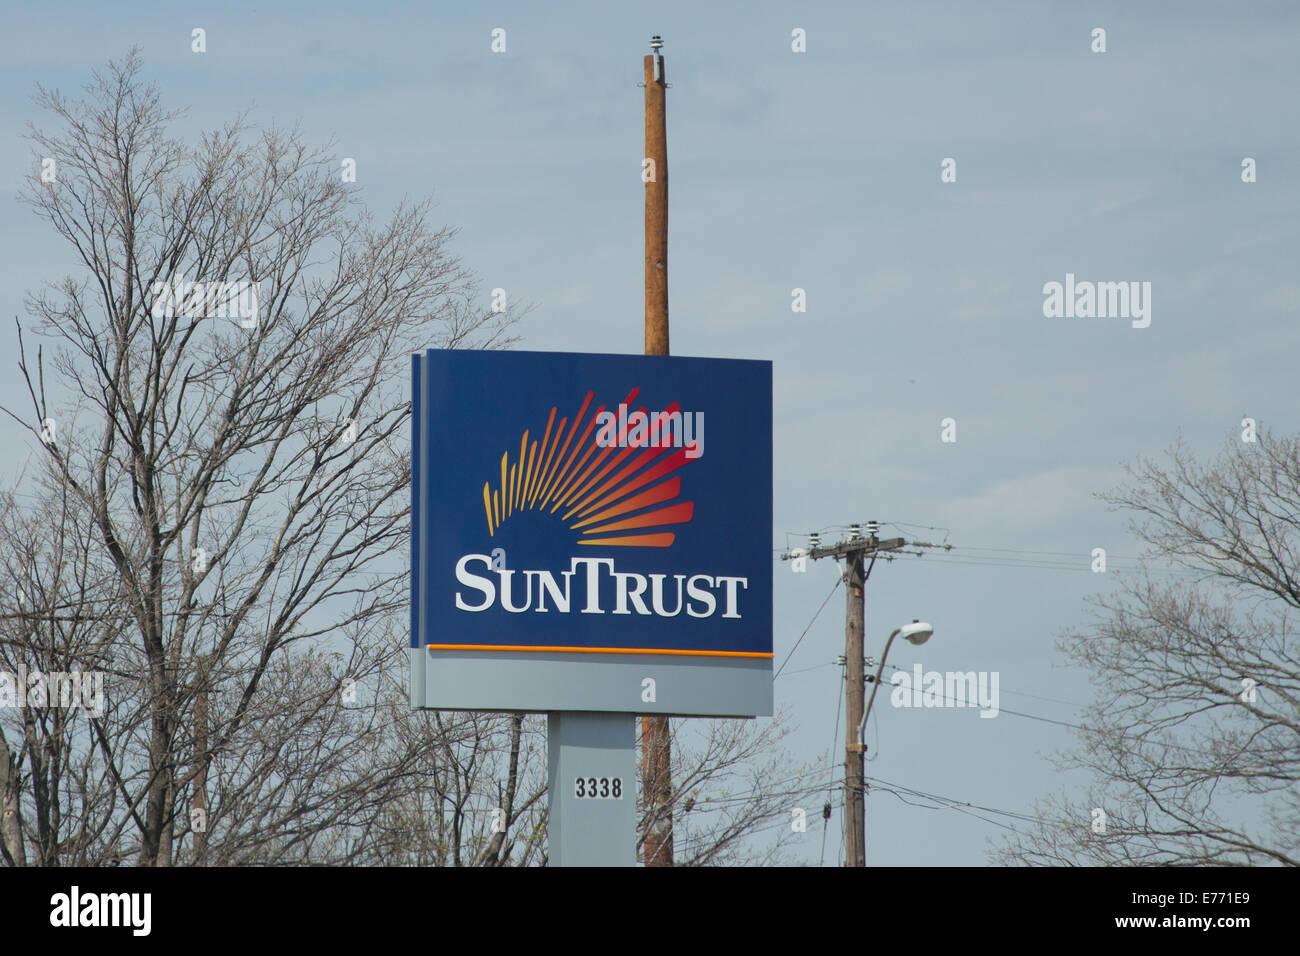 Suntrust Bank sign Stock Photo: 73298913 - Alamy